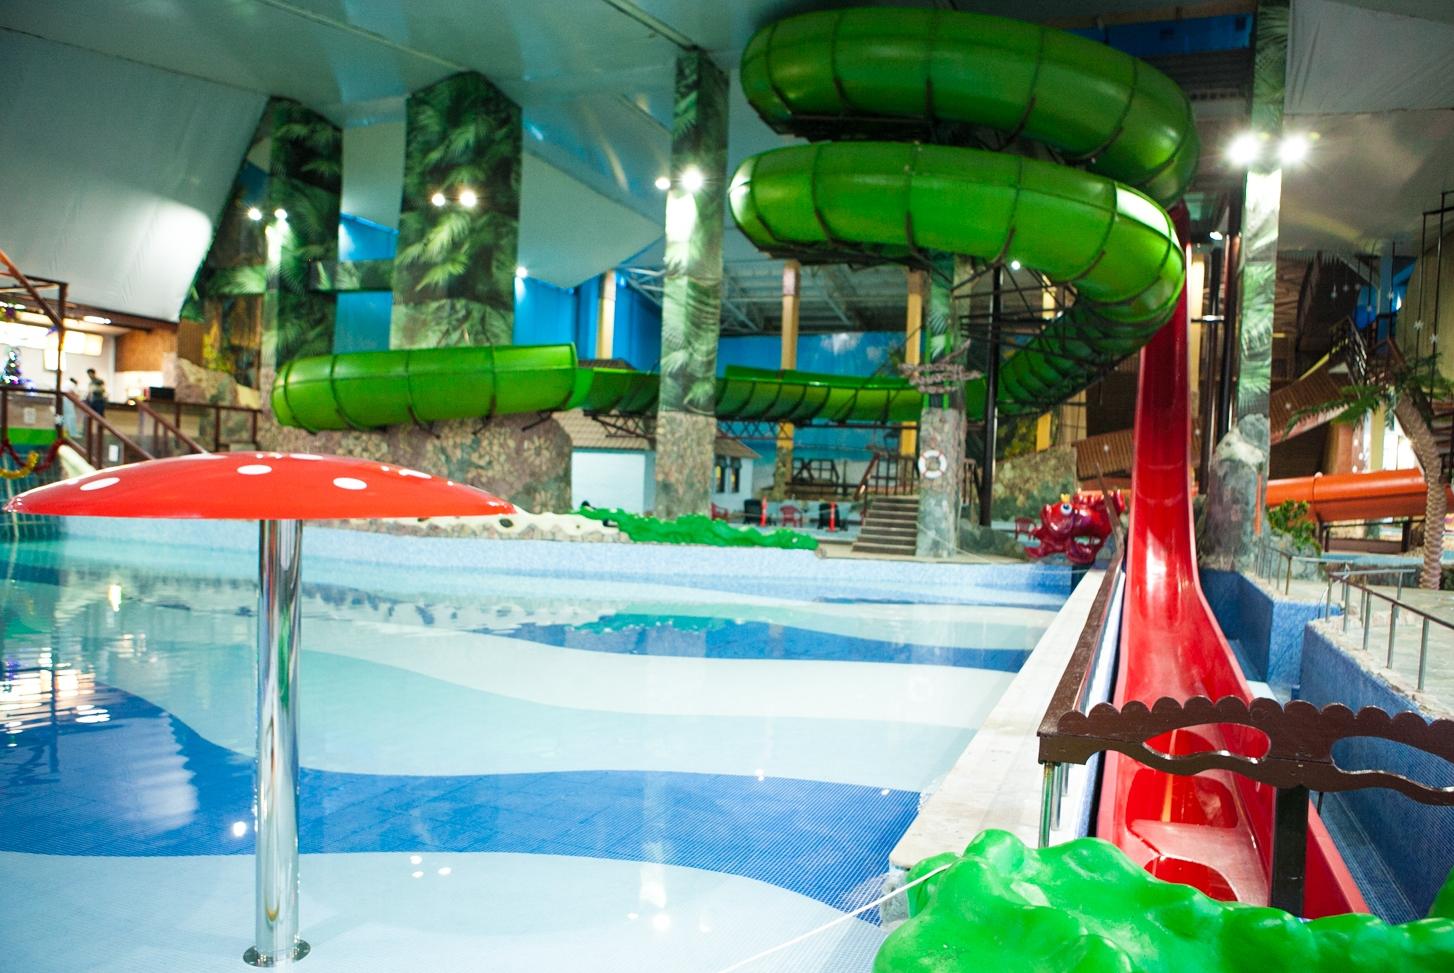 здесь фэнтези парк аквапарк фото усадки позволяет производить